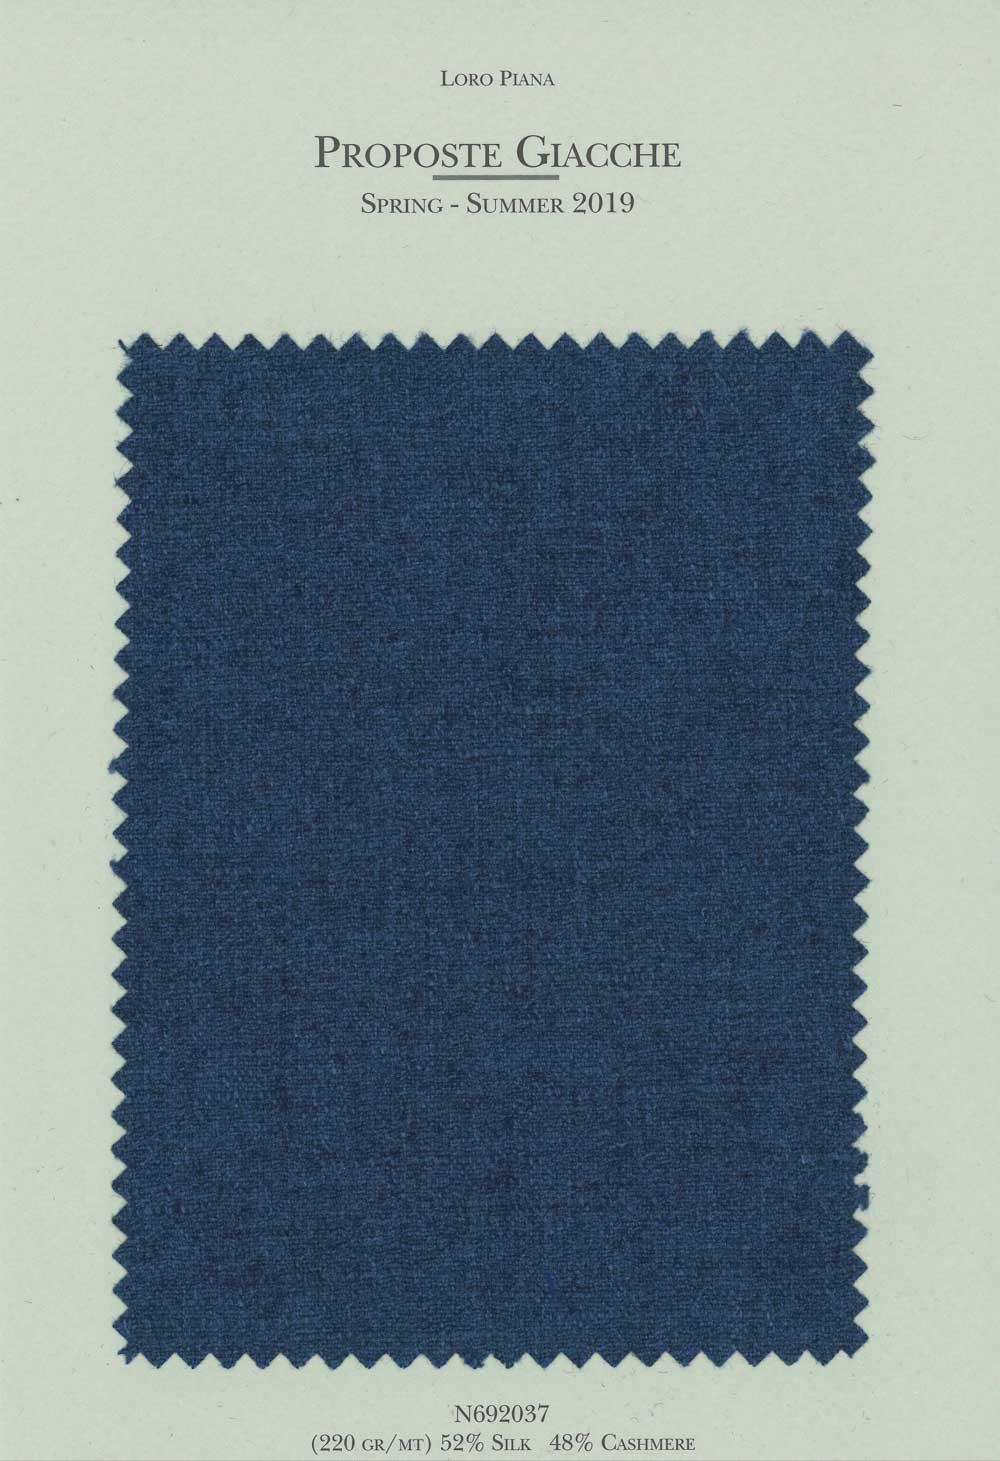 N692037